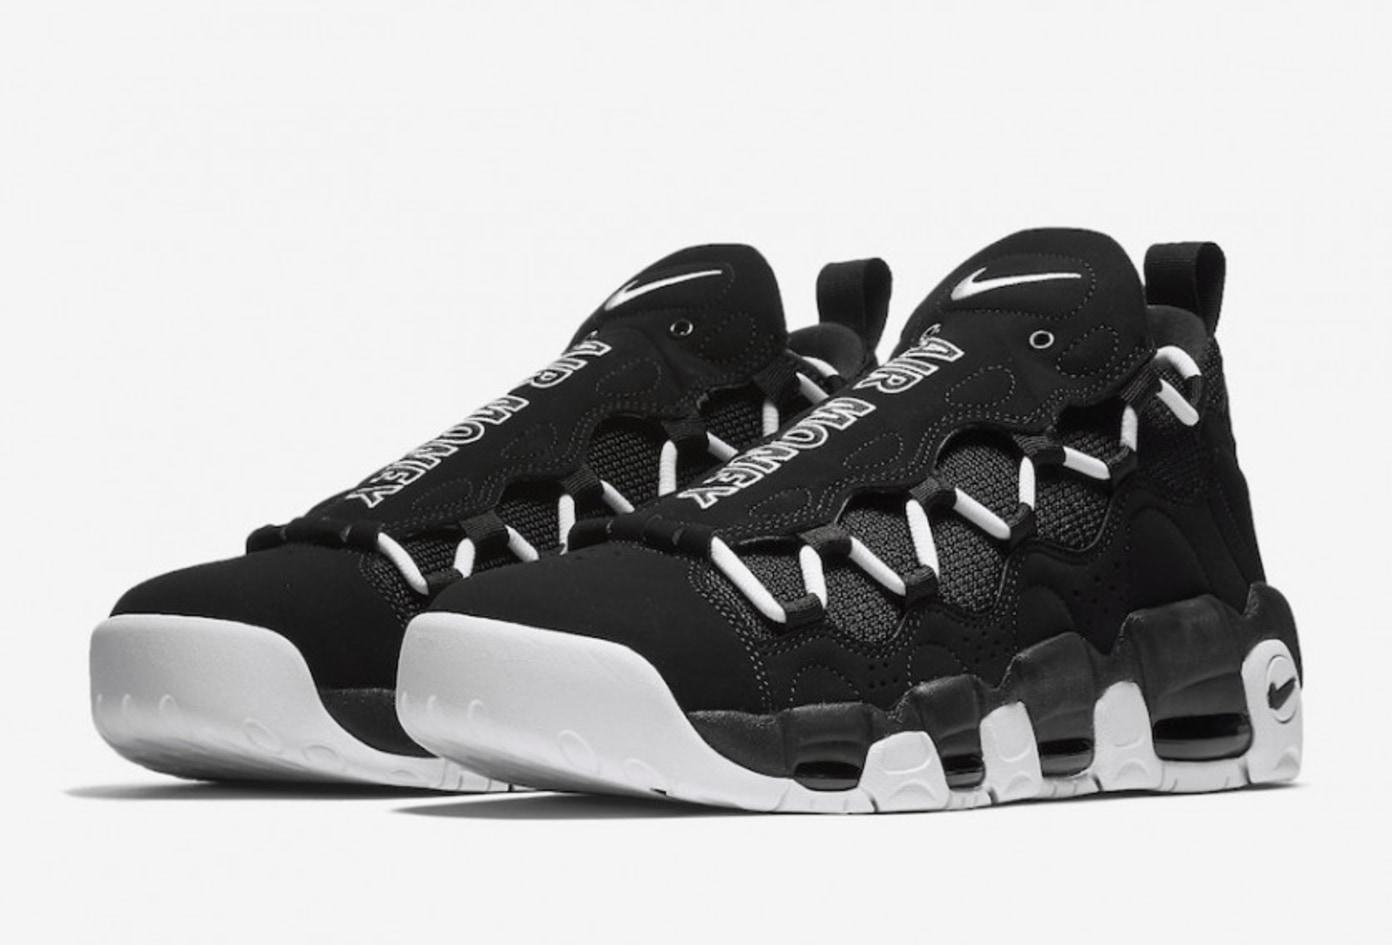 Nike Air More Money In Black/White